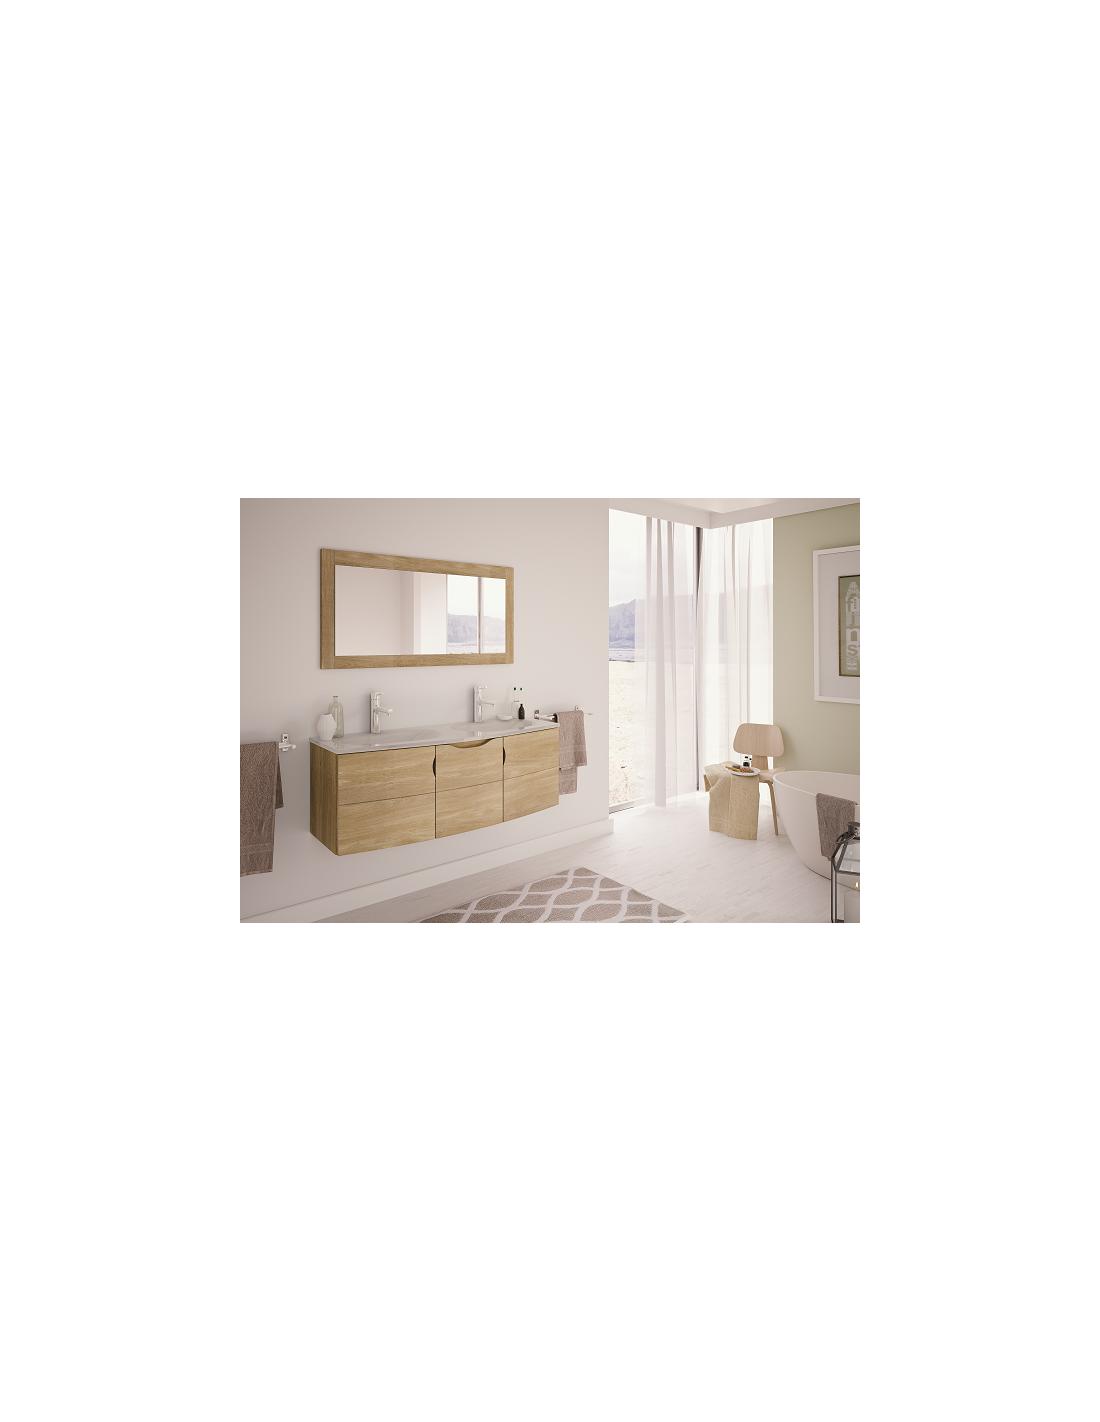 meuble 130 cm vague du nord collin arredo. Black Bedroom Furniture Sets. Home Design Ideas